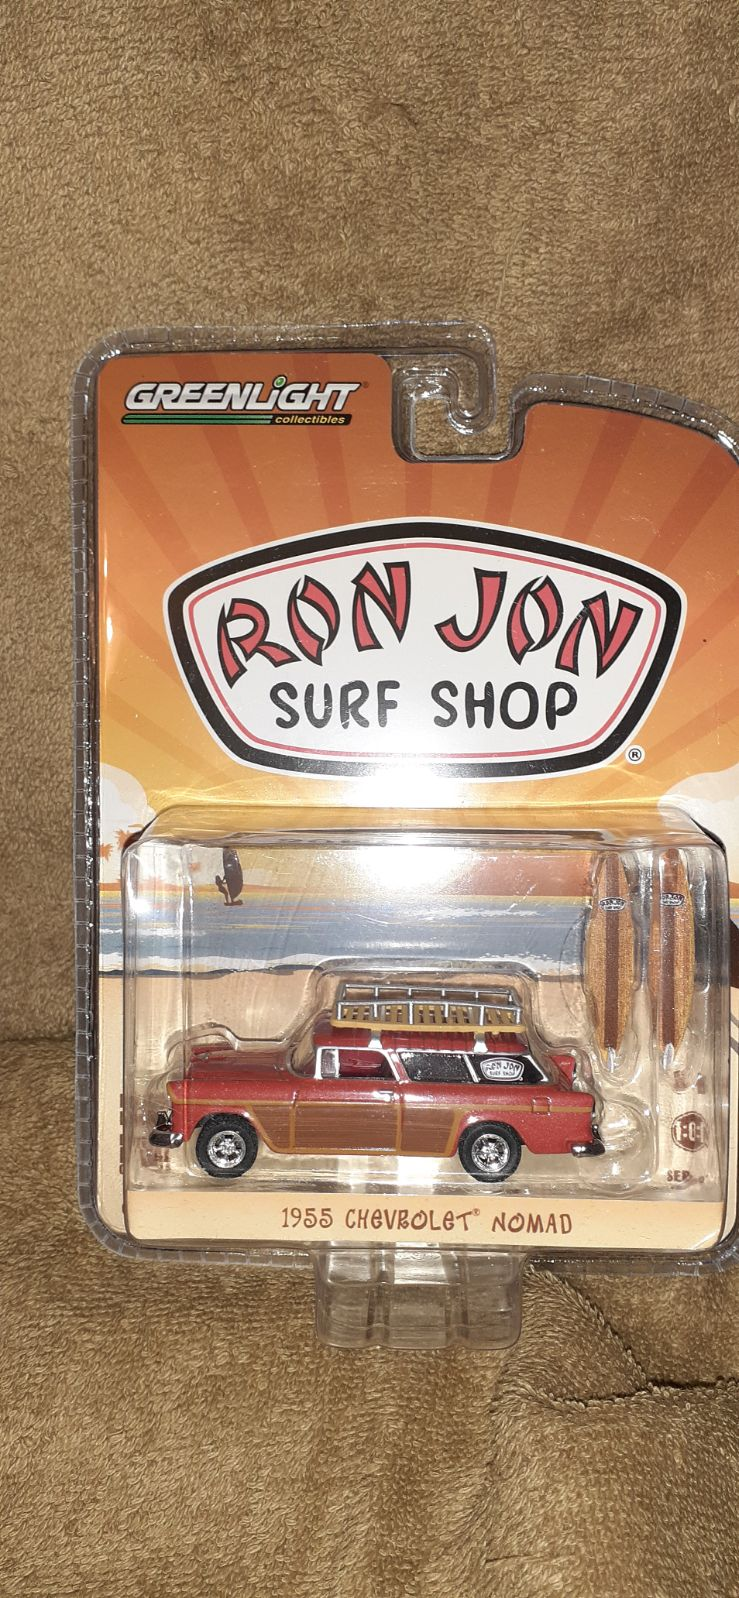 Greenlight LE ron jon surf shop 55 nomad